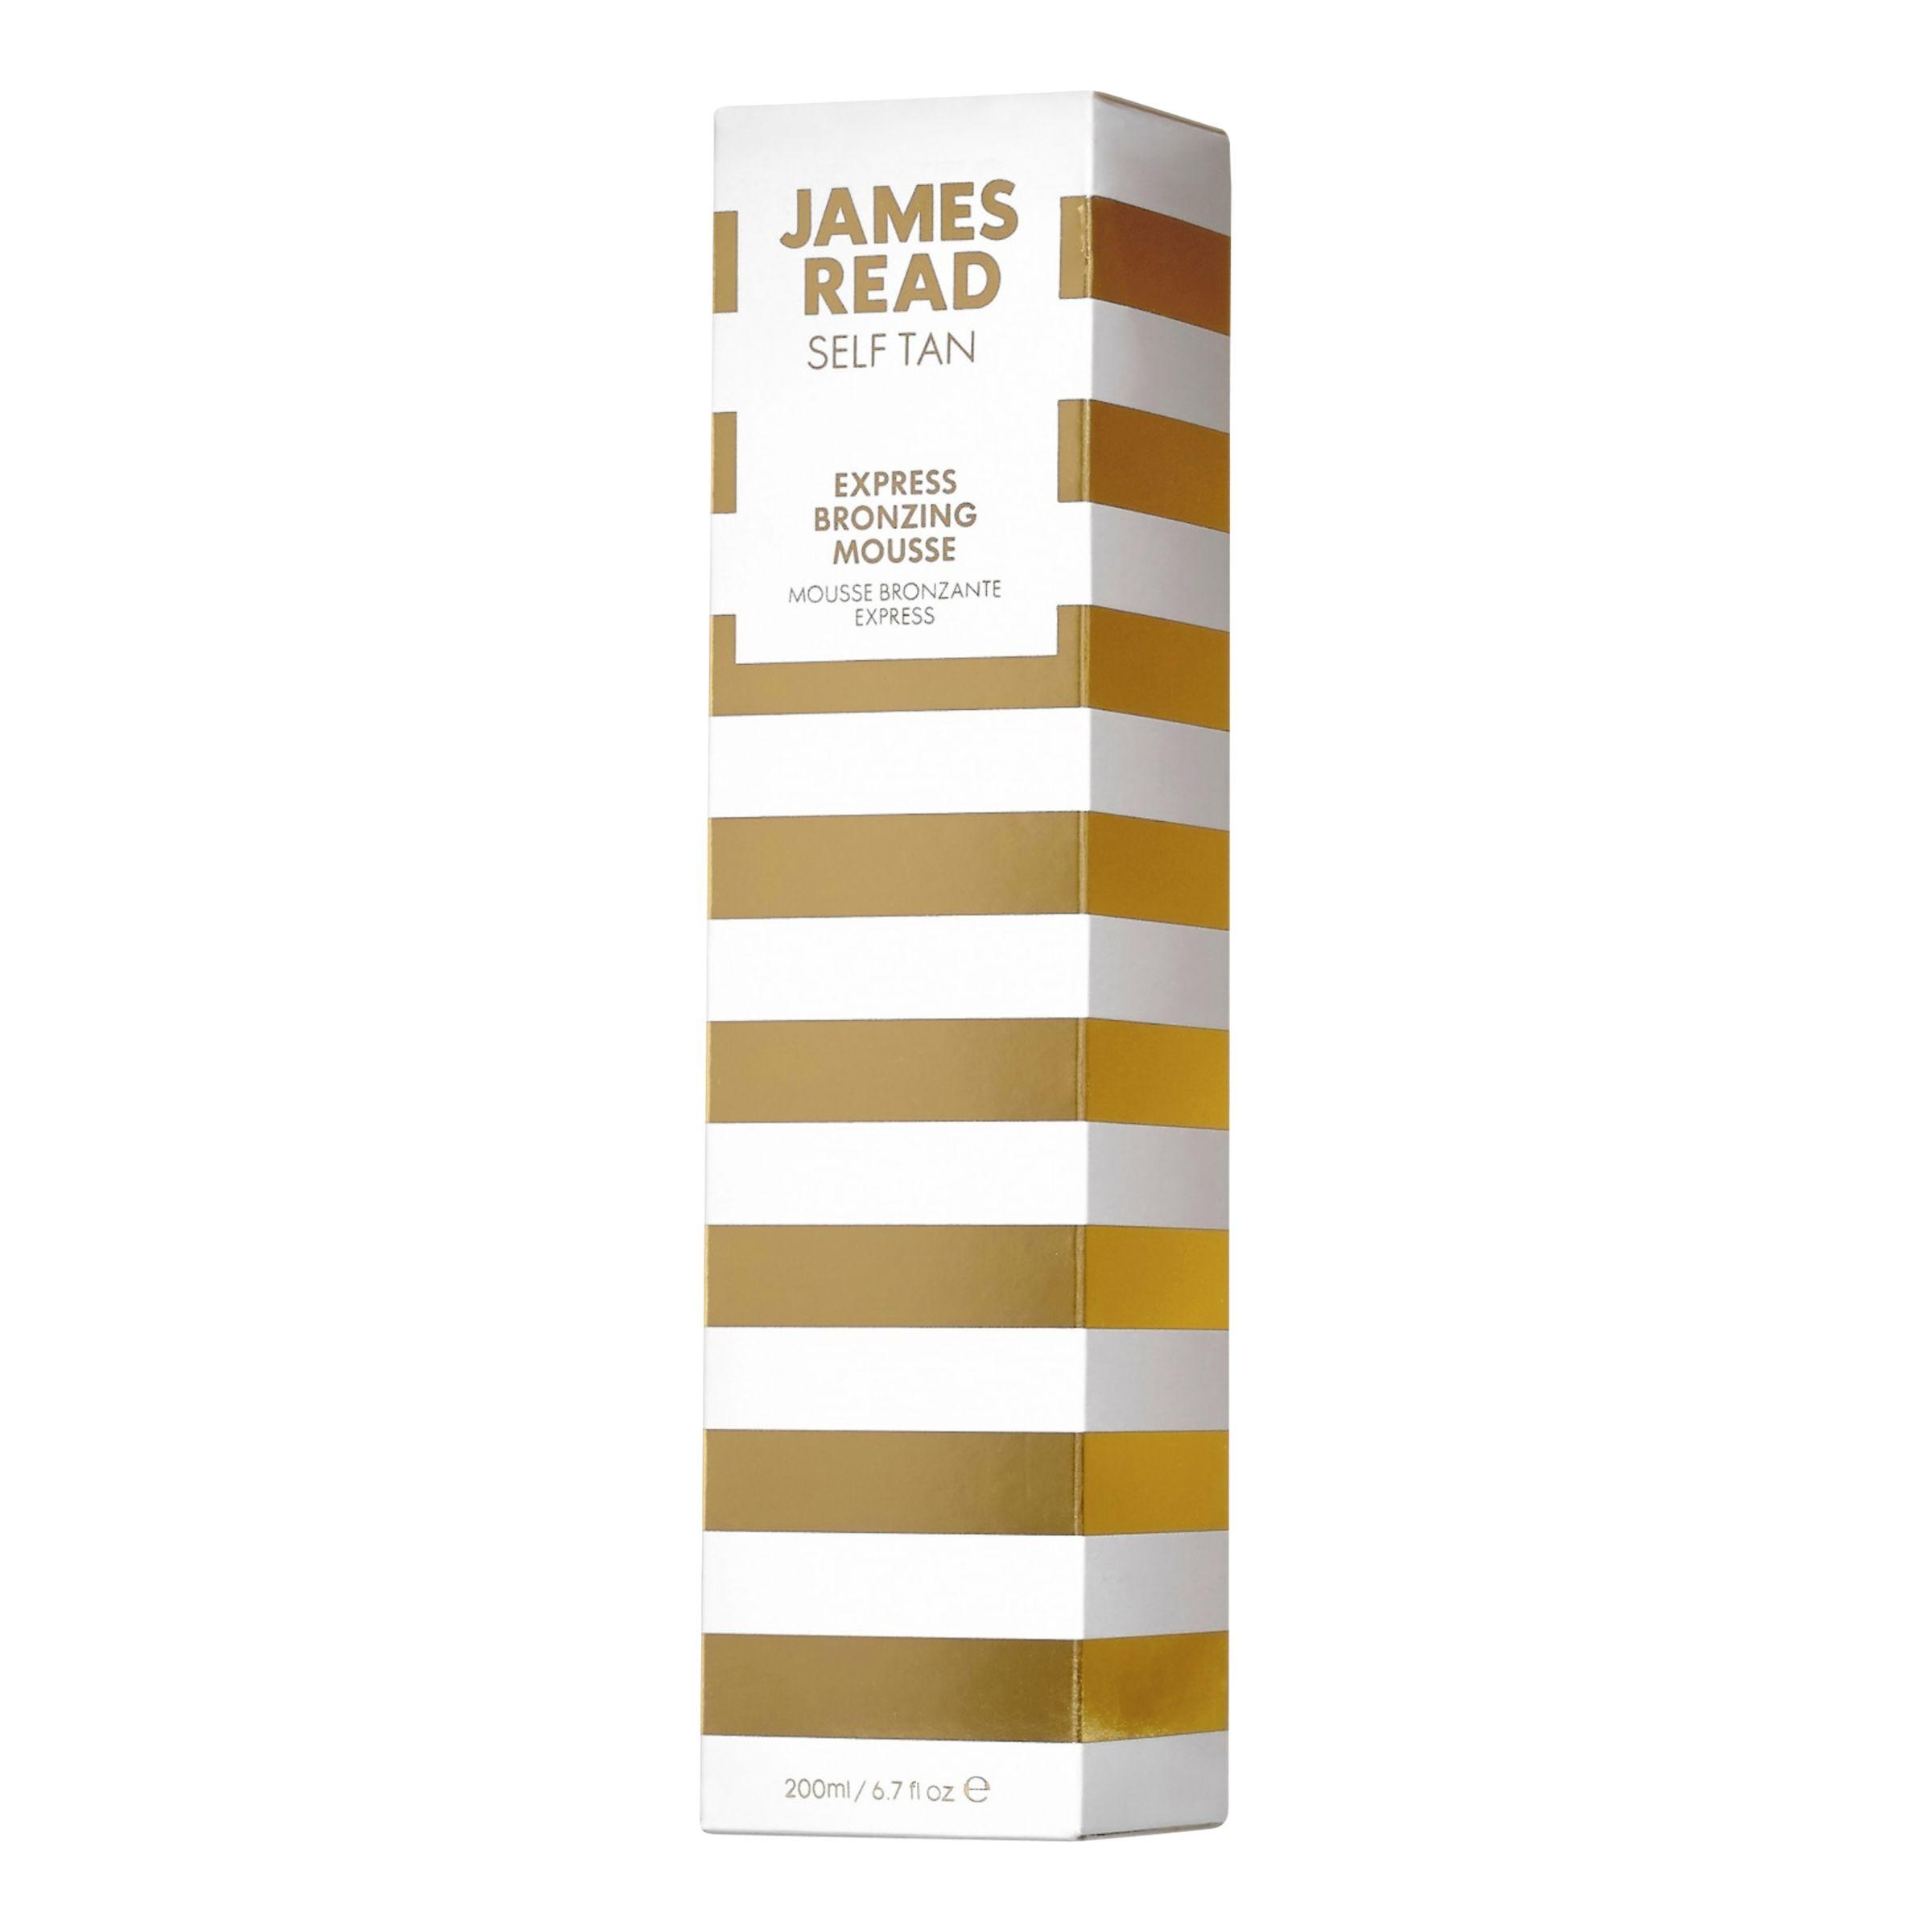 James Read James Read Express Bronzing Mousse, 200ml